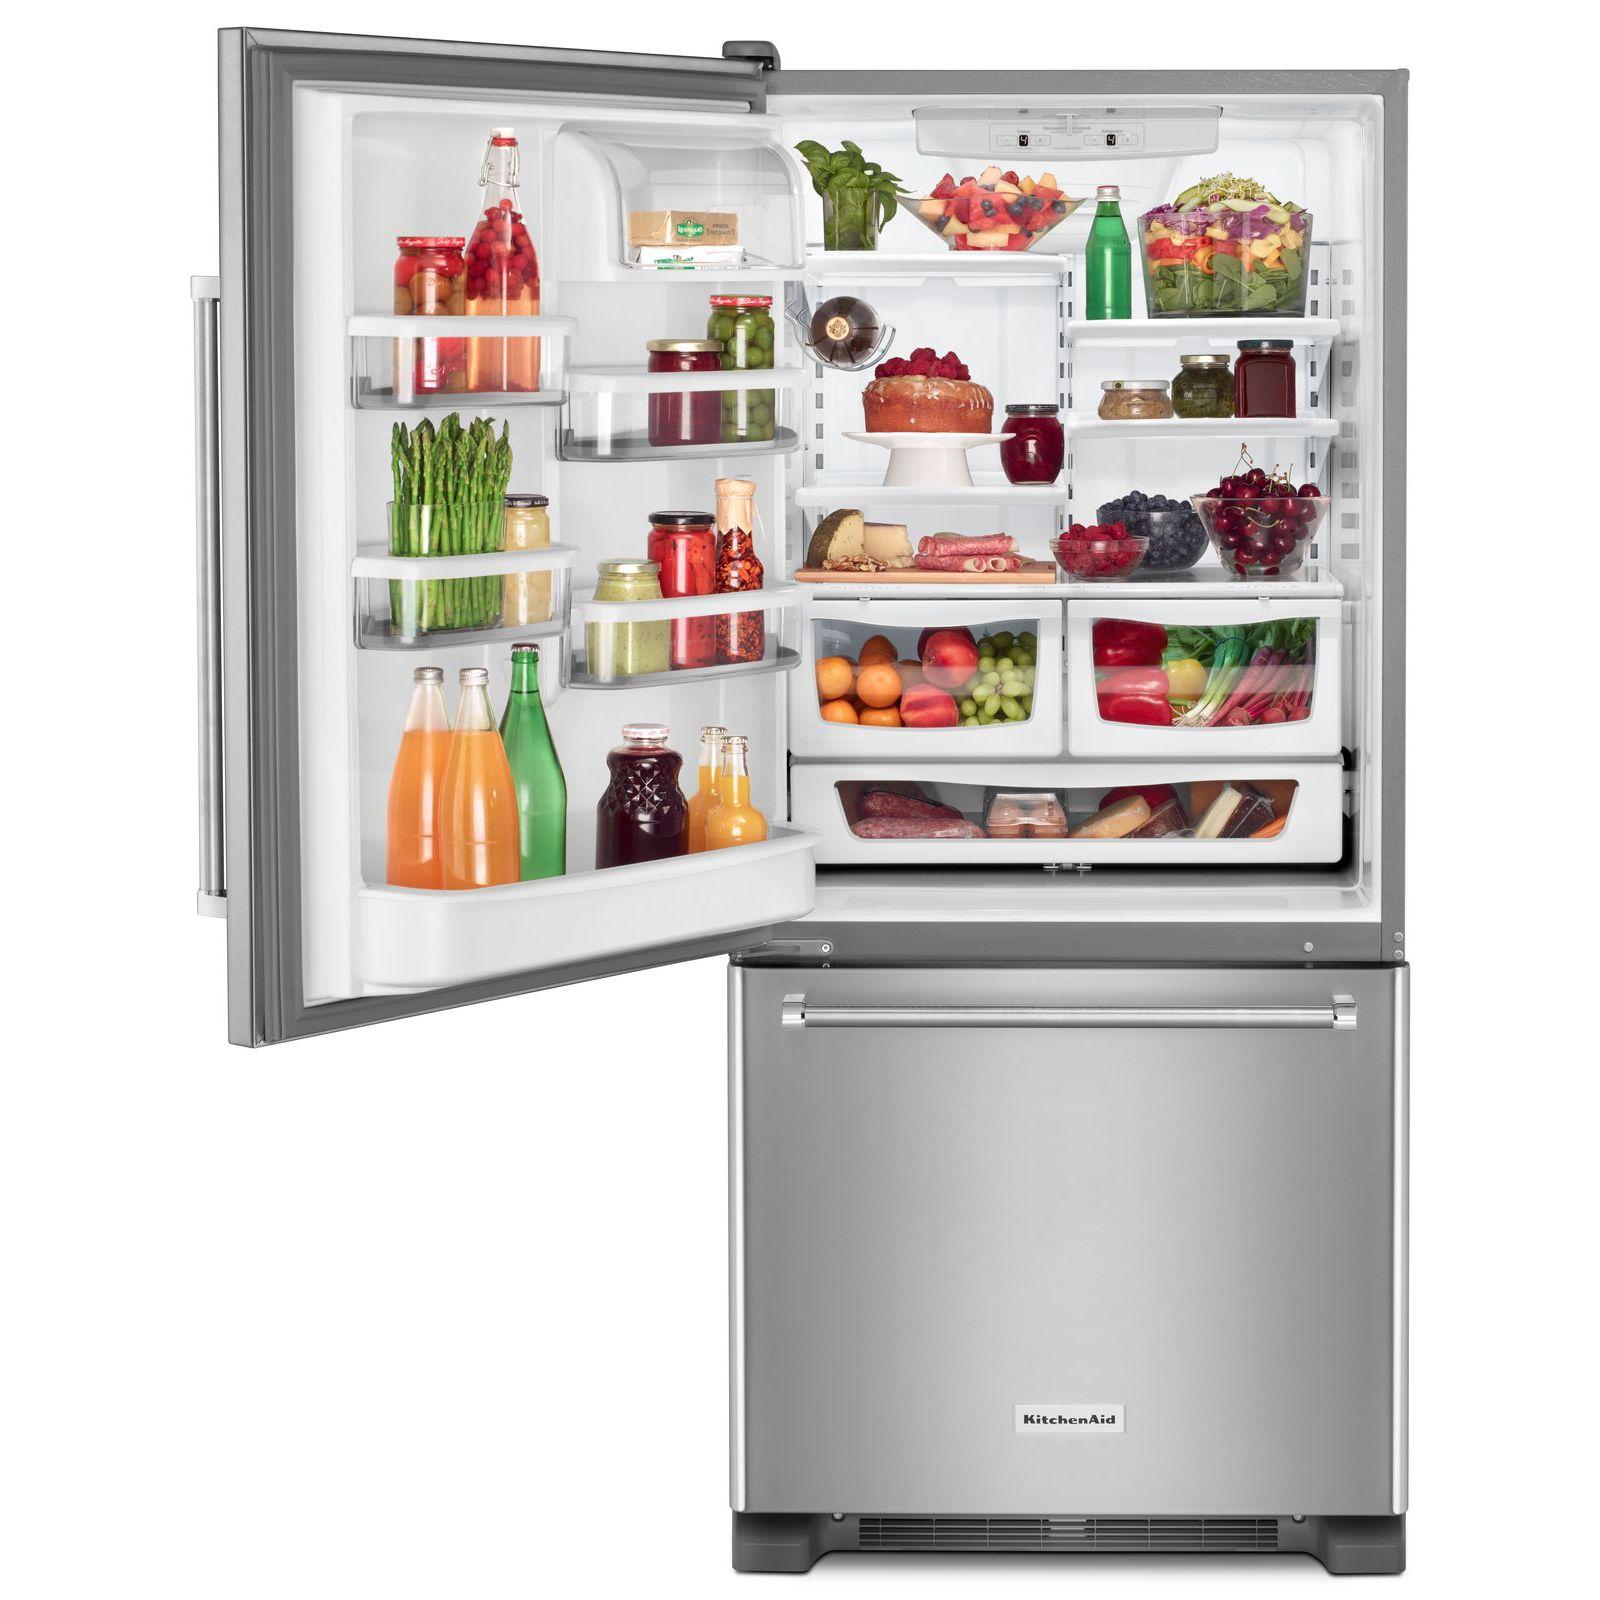 KitchenAid KRBL109ESS 19 cu. ft. Bottom Mount Refrigerator - Stainless Steel